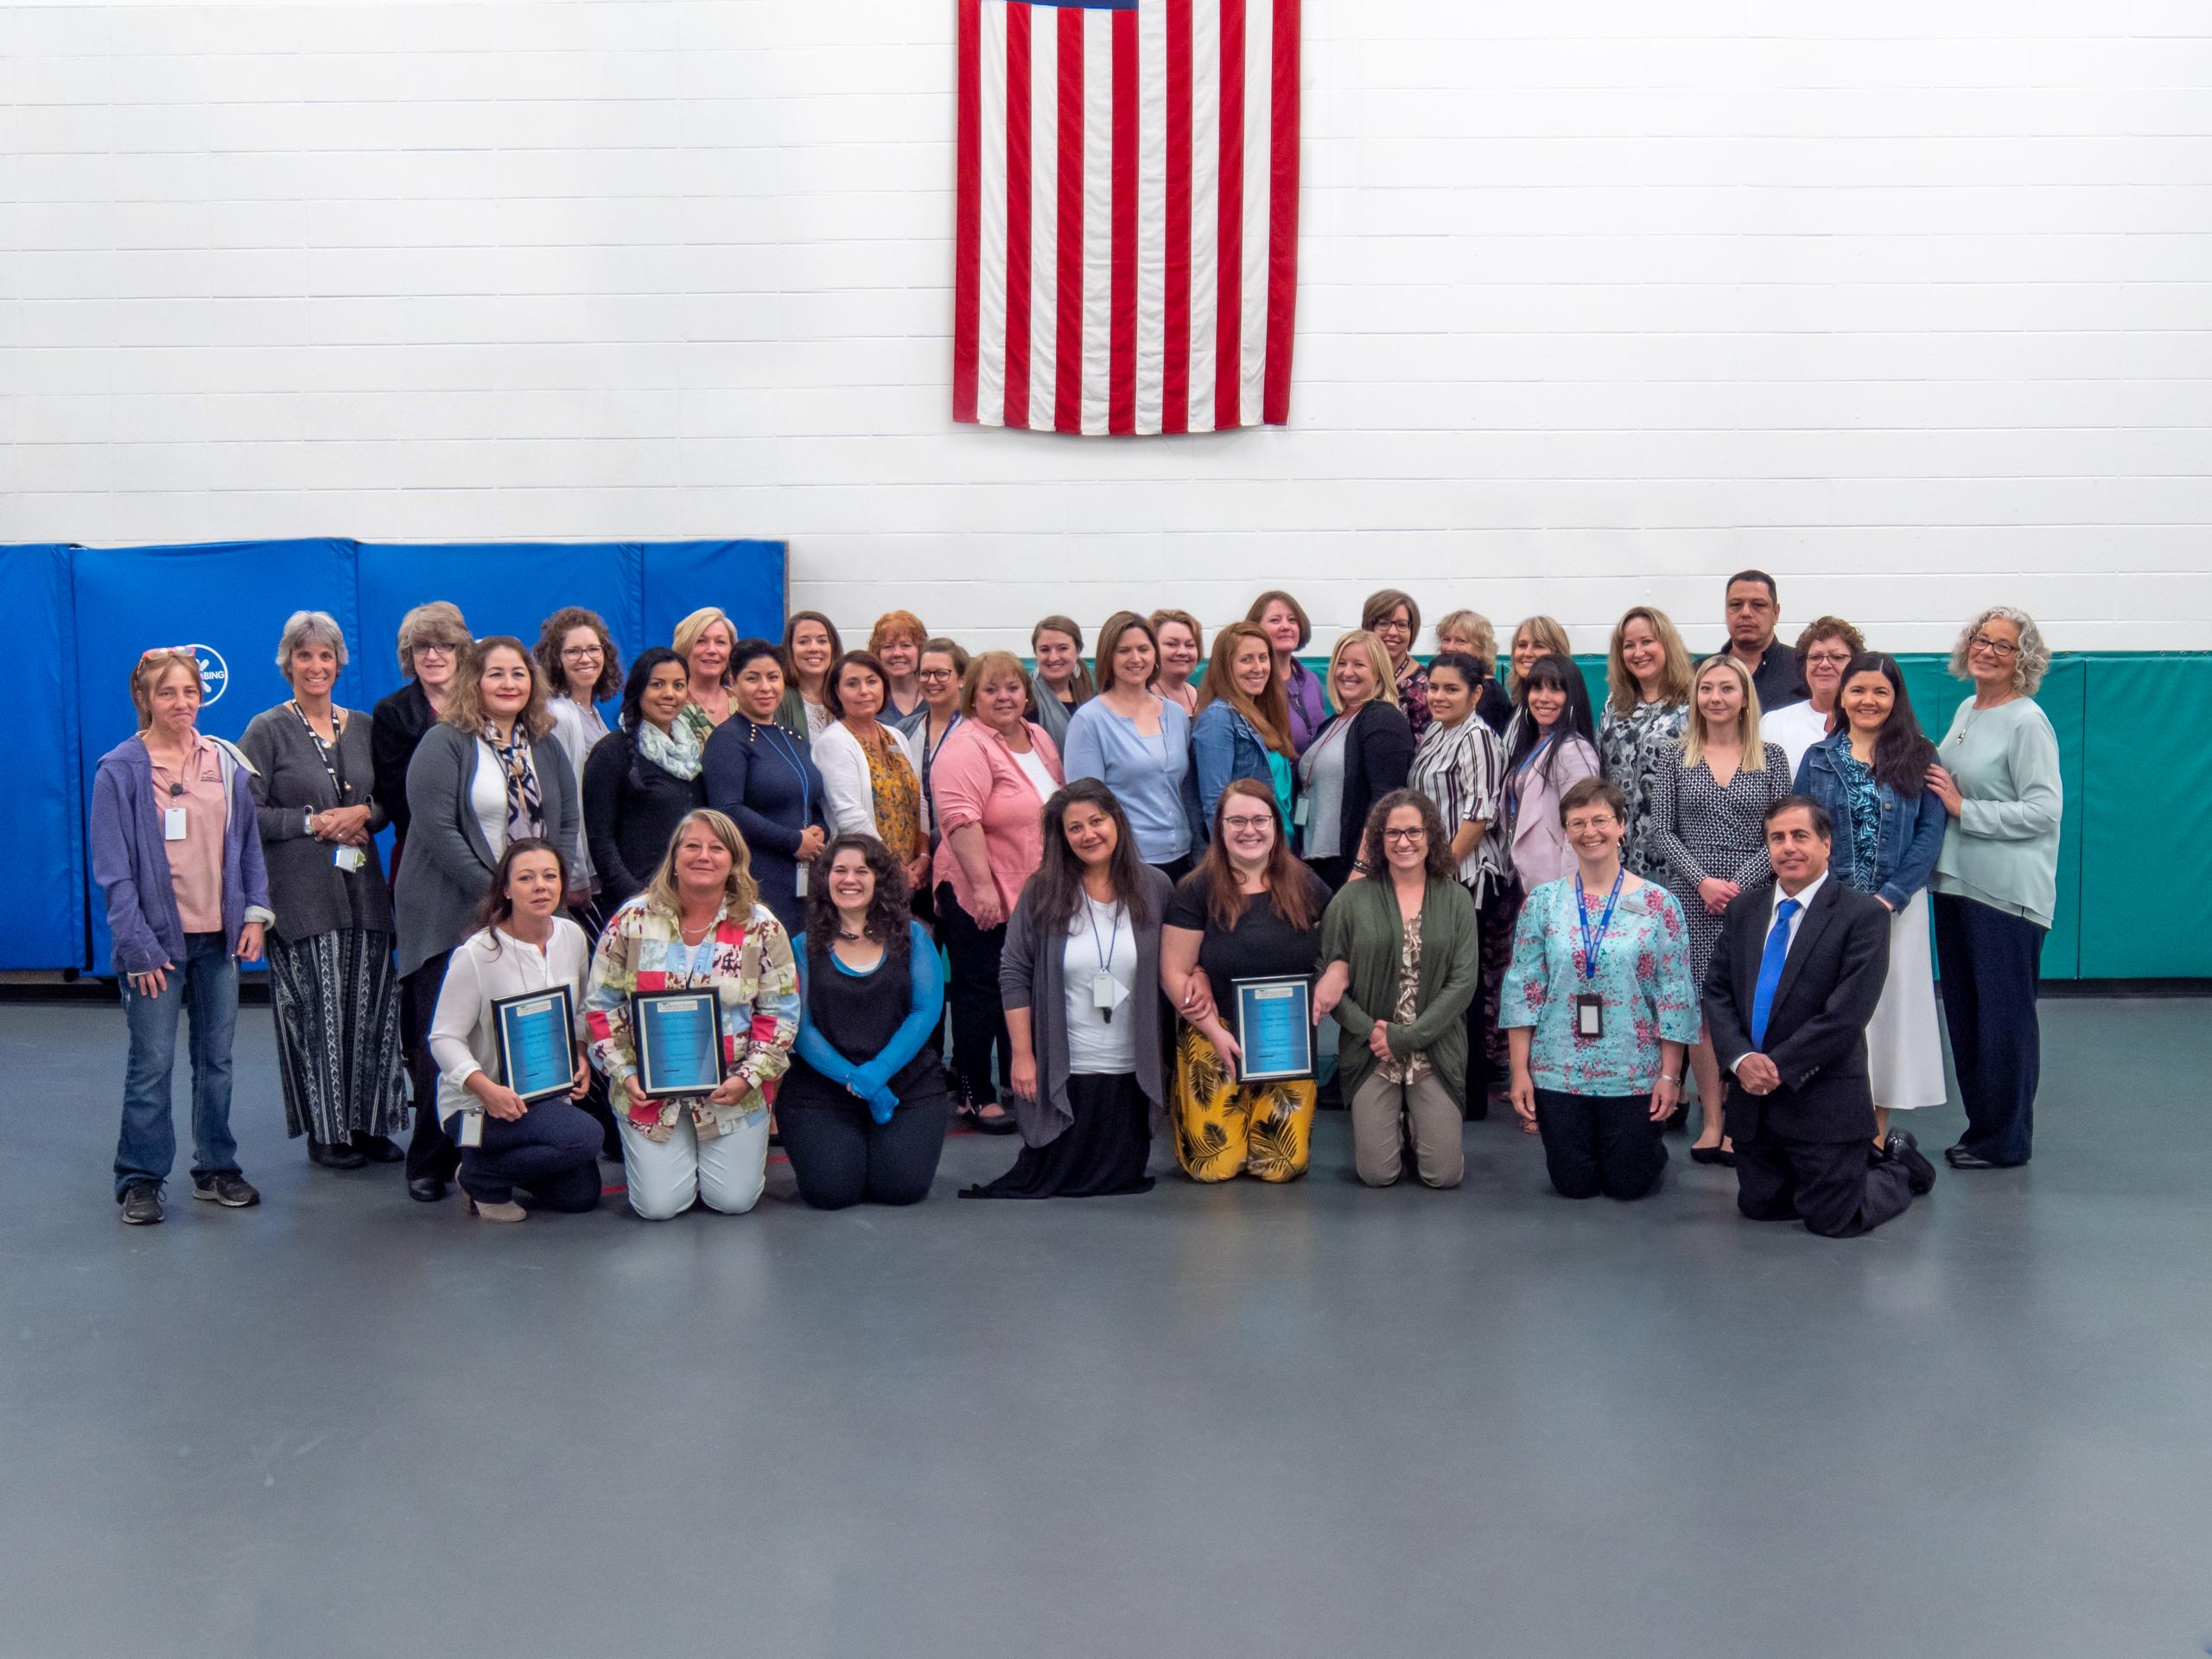 Northridge Elementary School Staff